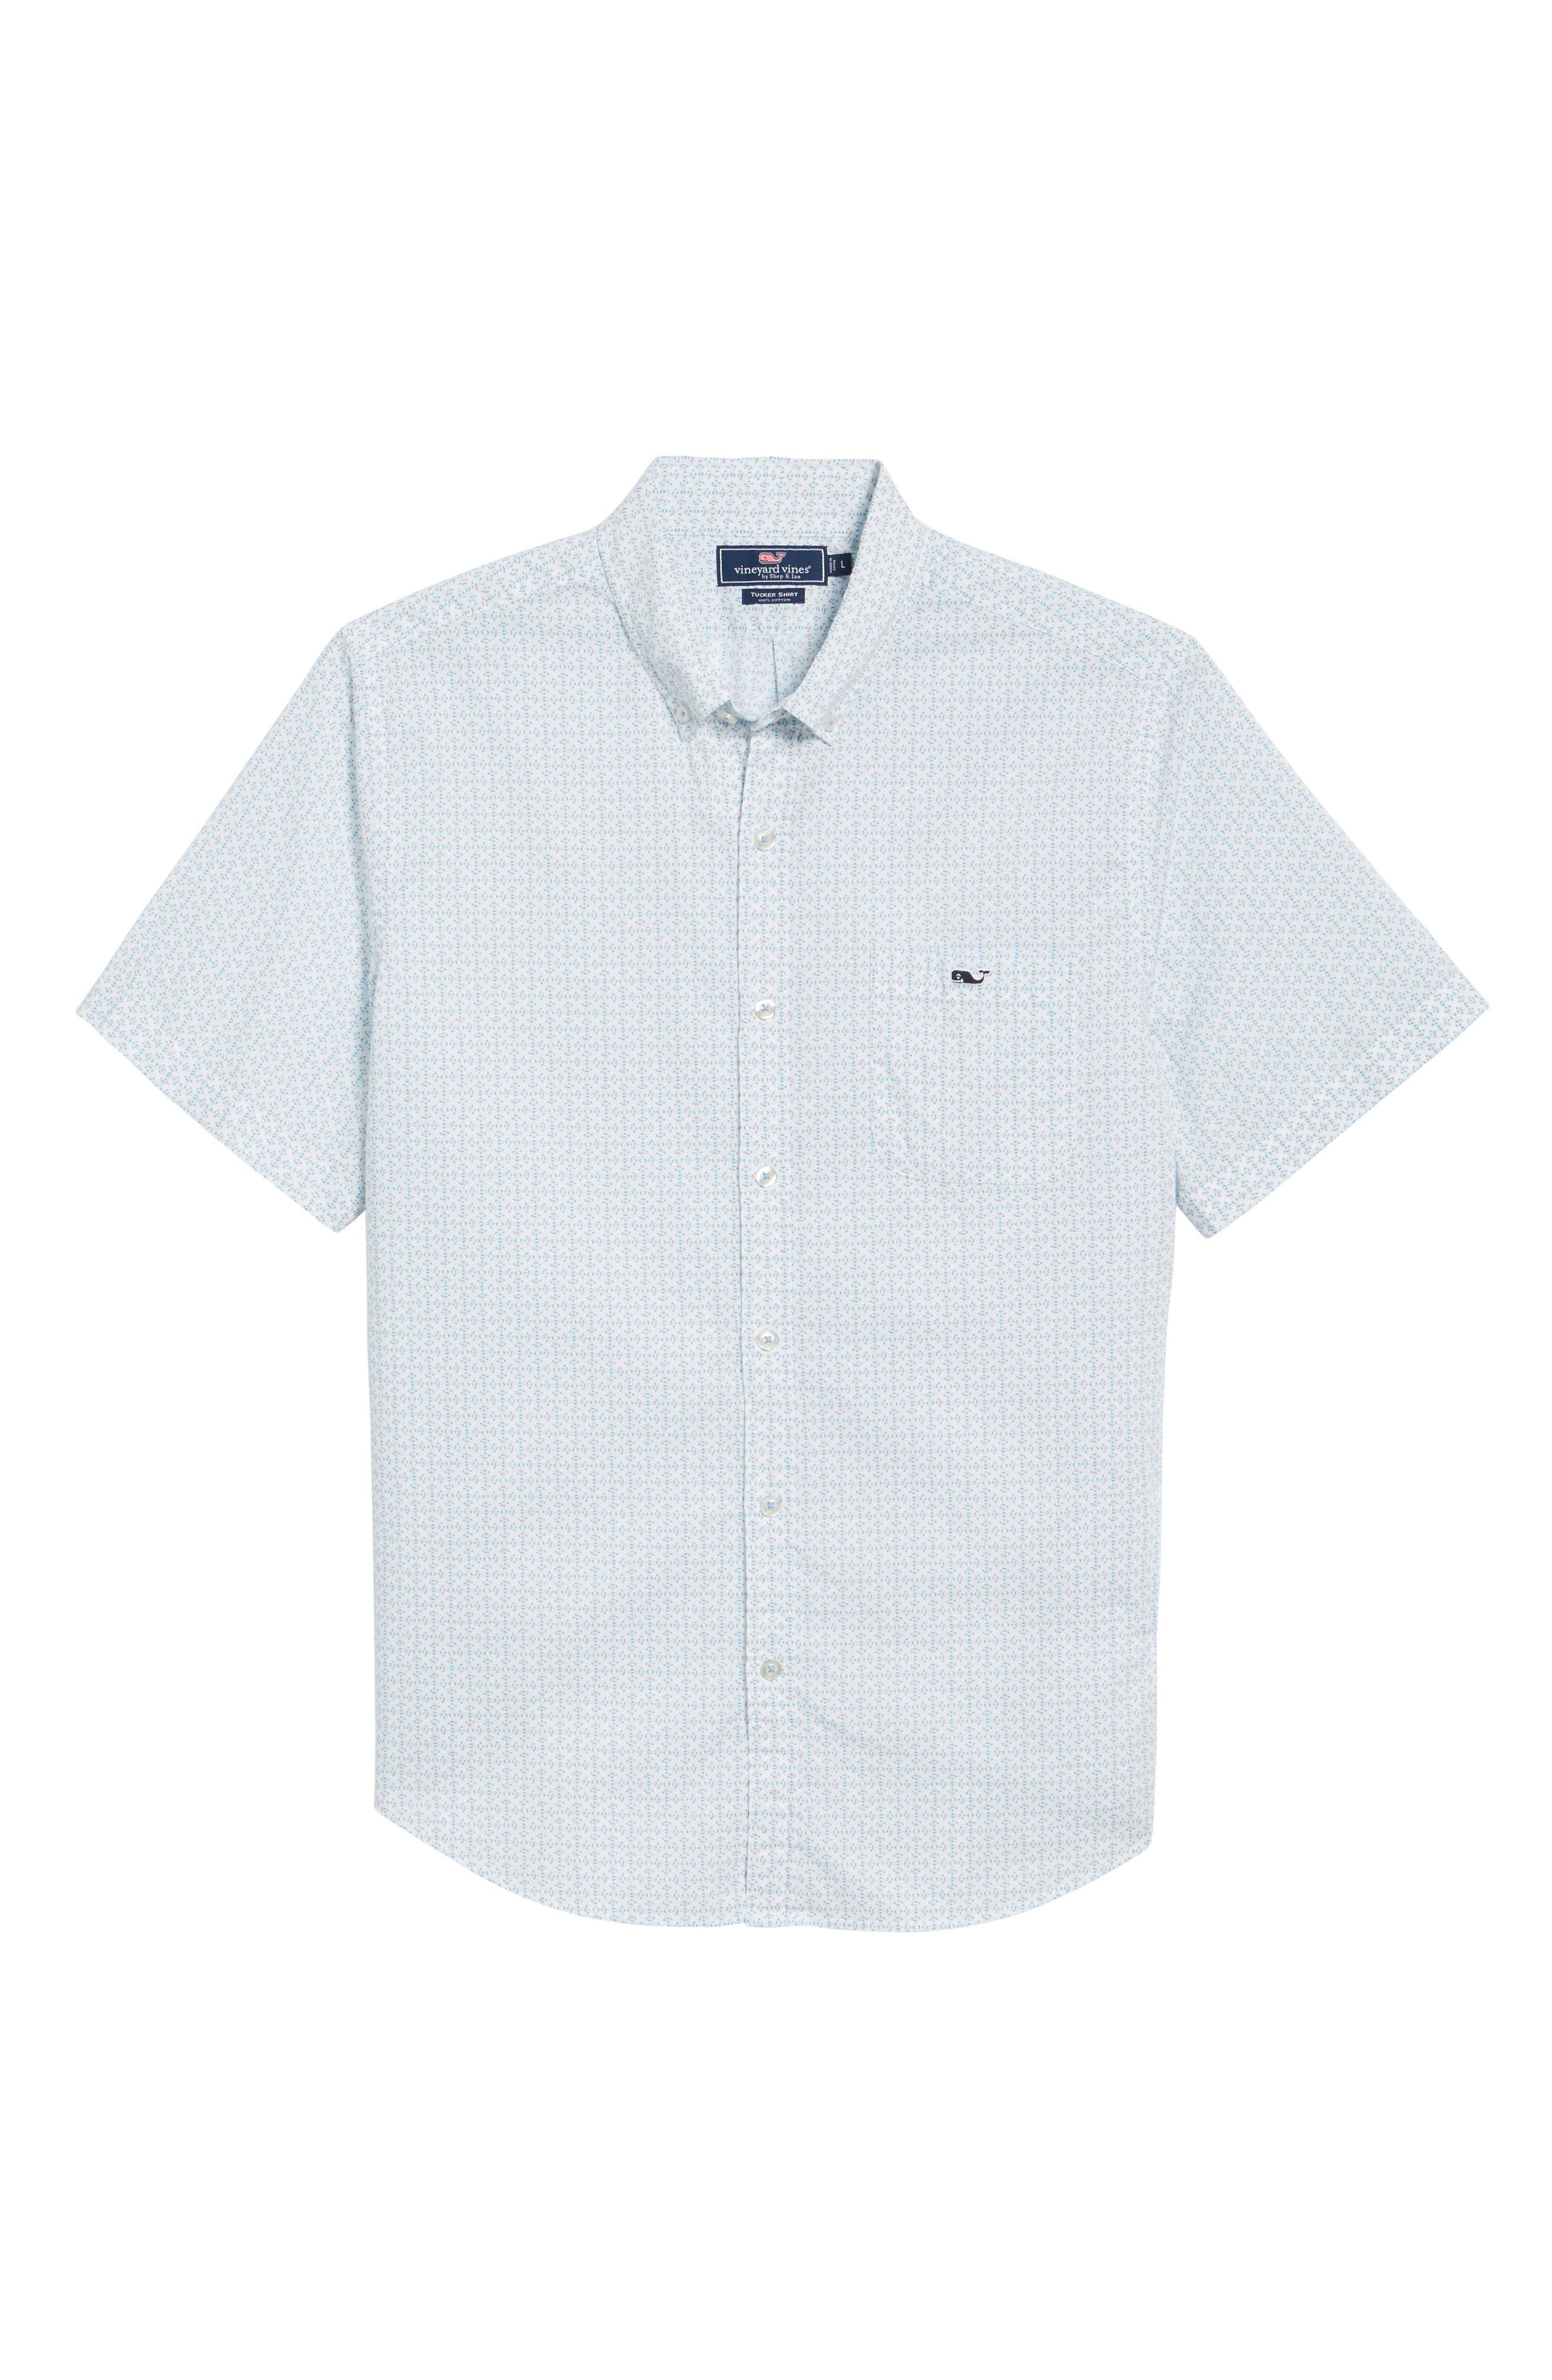 Fish Check Tucker Slim Fit Sport Shirt,                             Alternate thumbnail 6, color,                             100